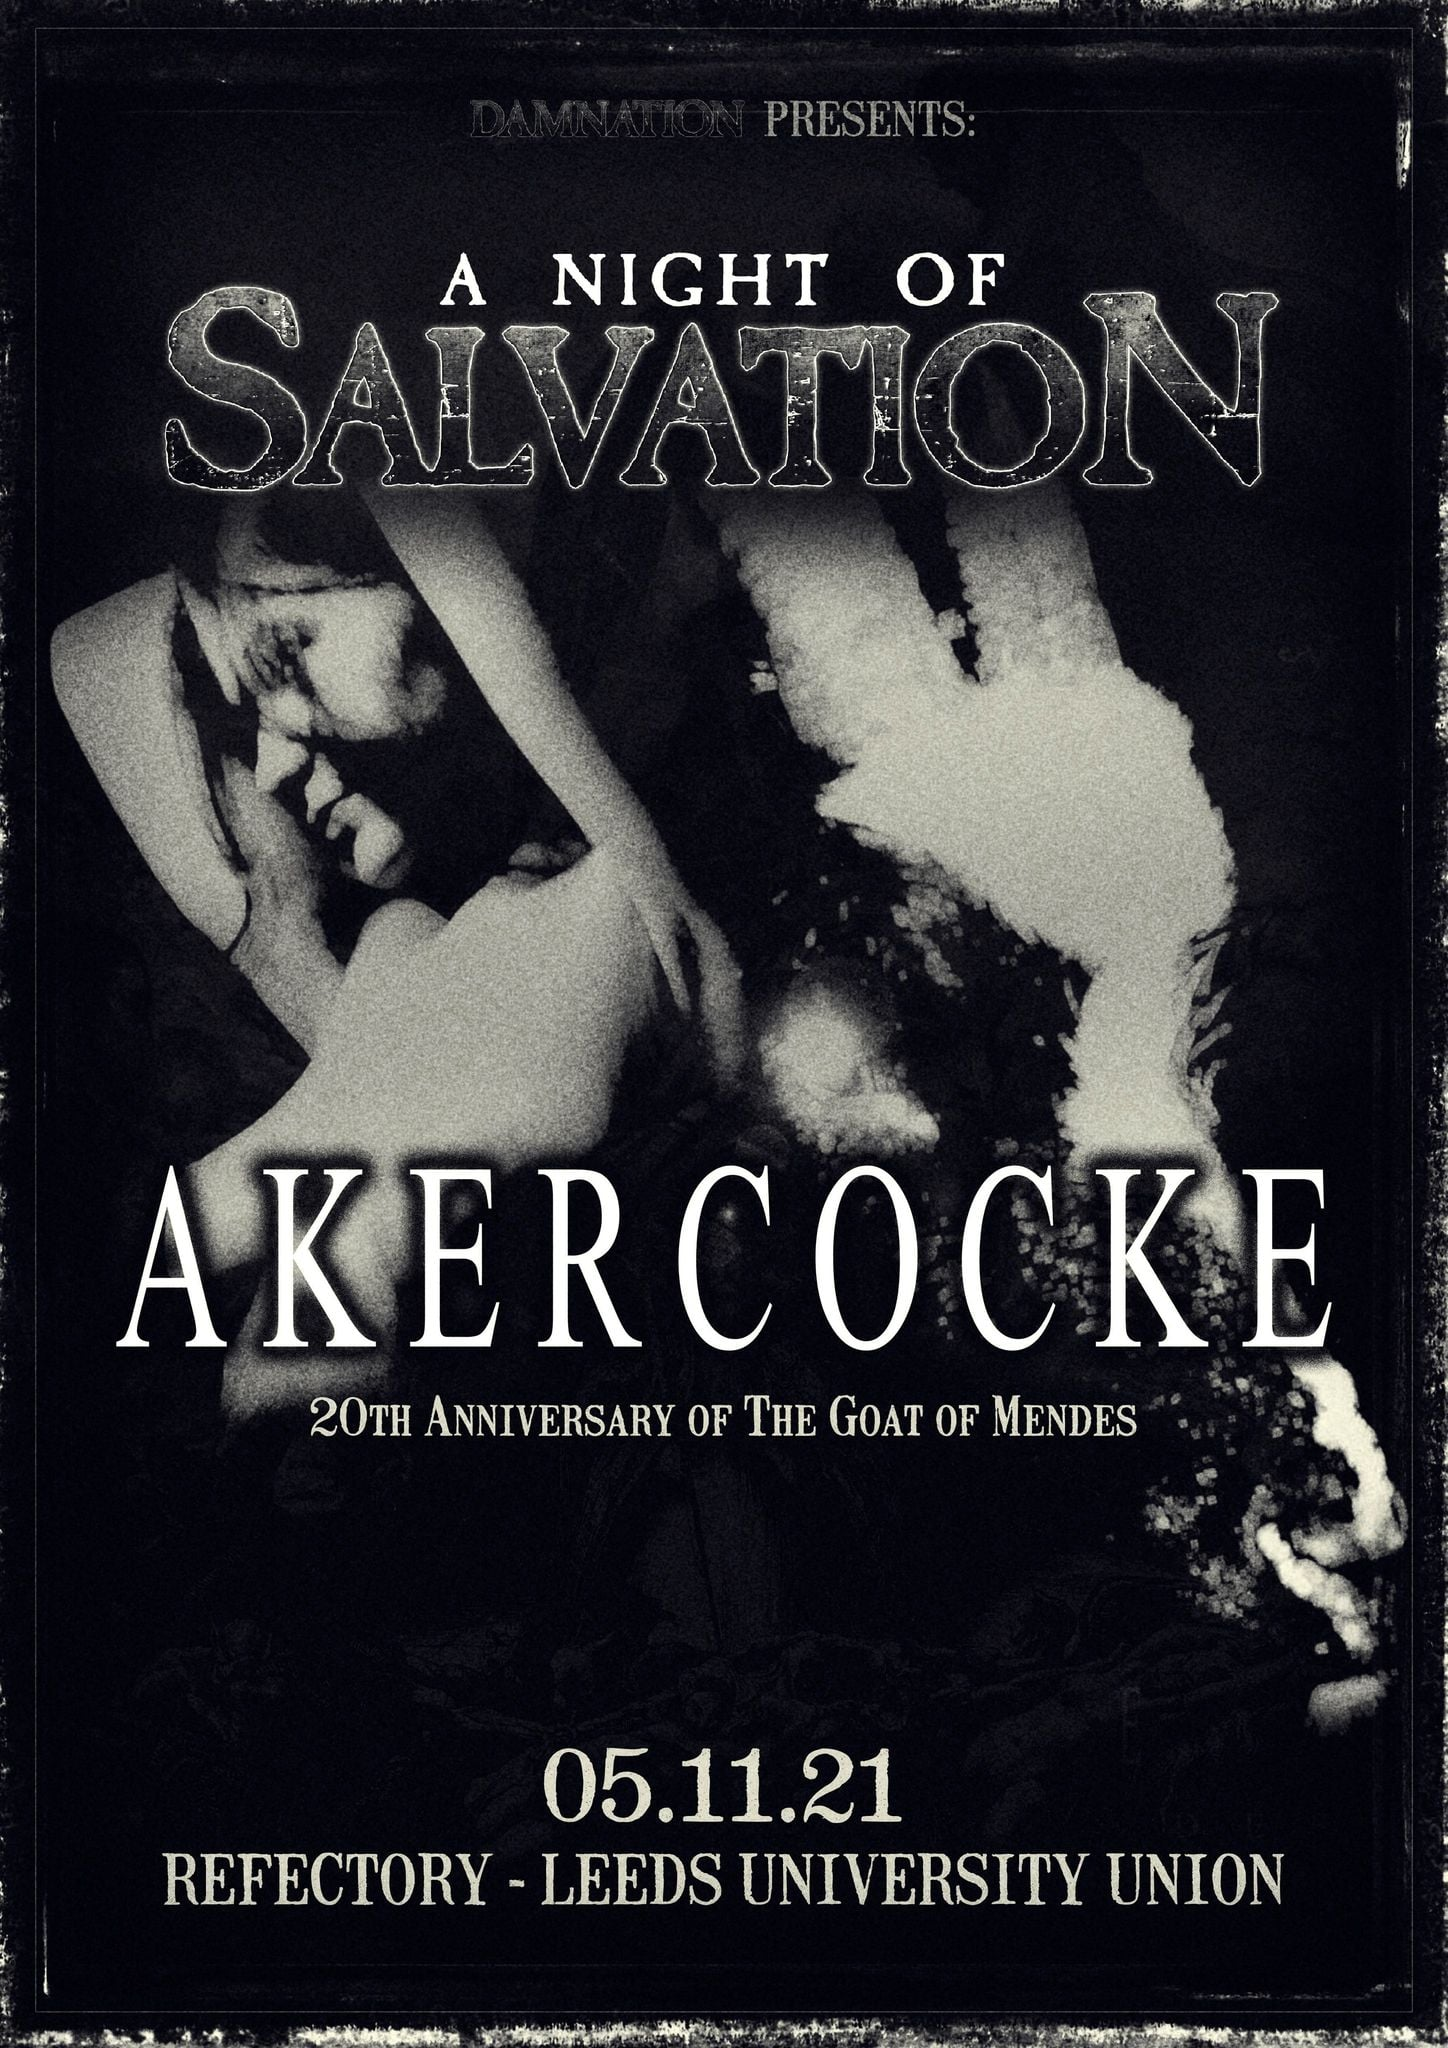 A Night of Salvation